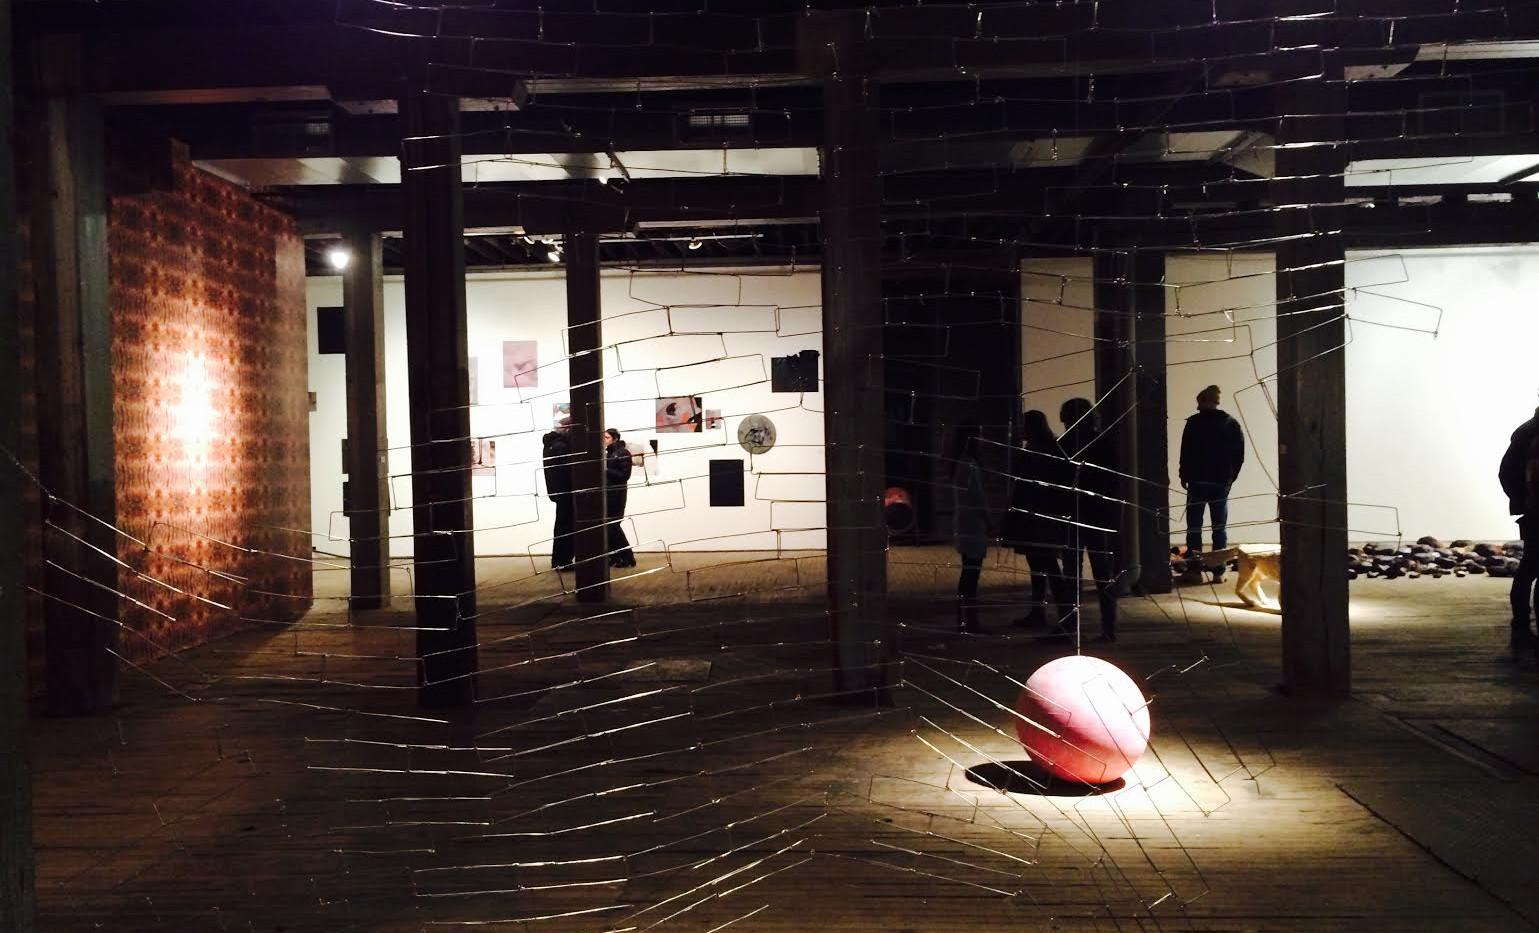 Installation View, Diaspora